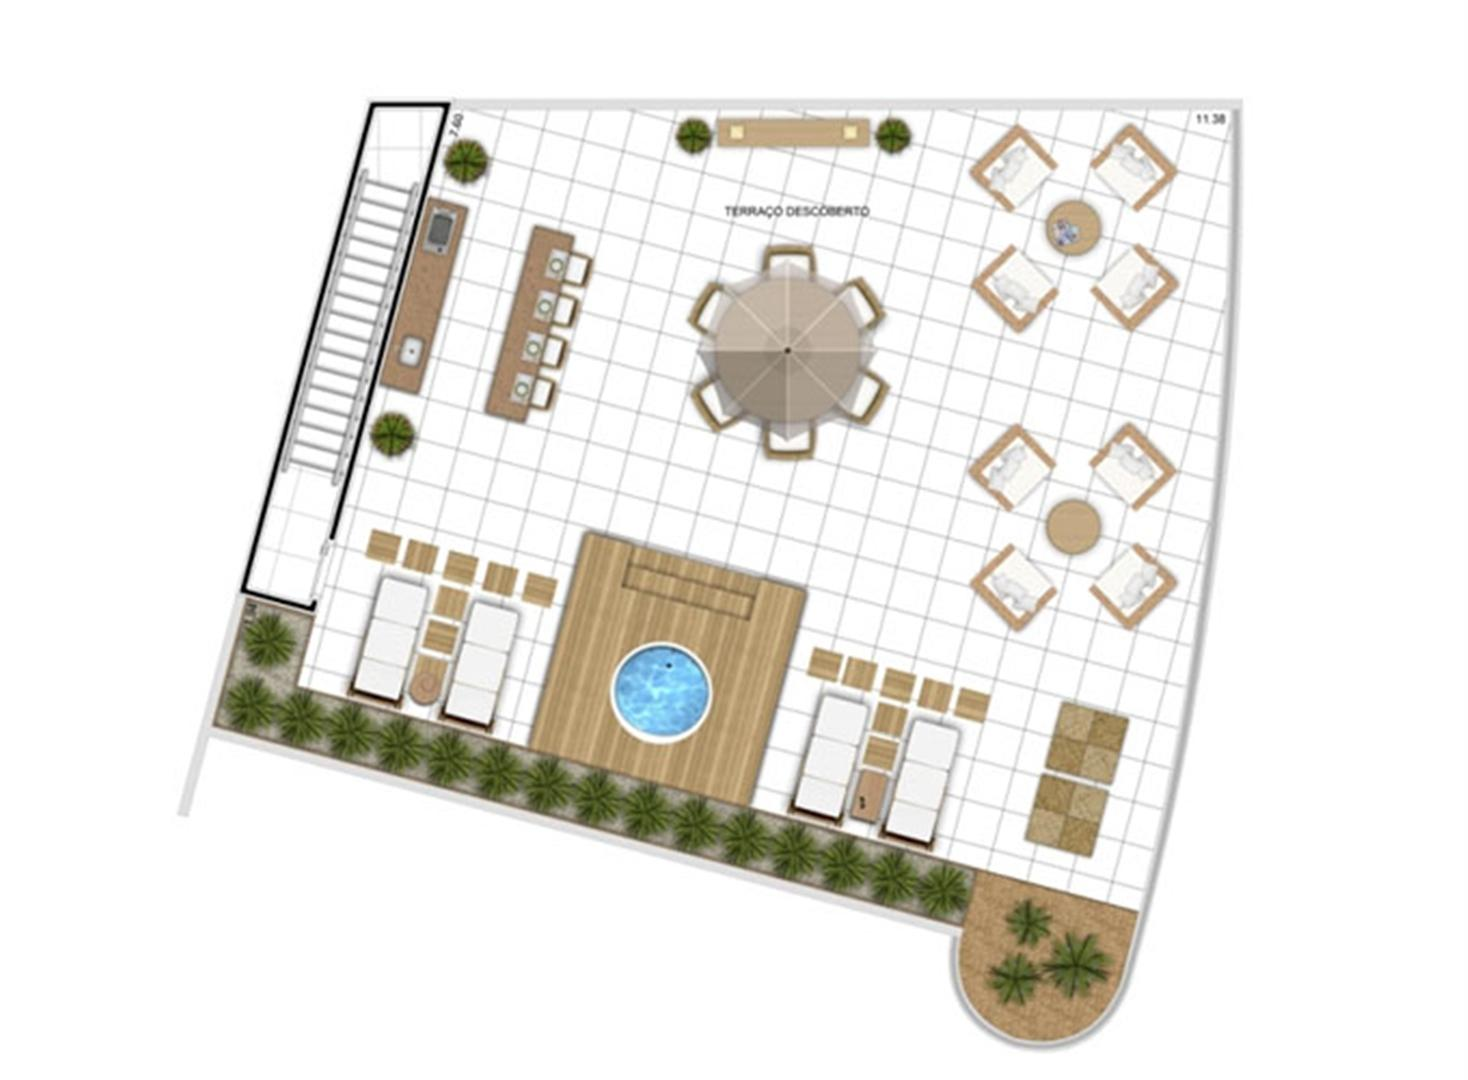 PLANTA - APTO TIPO E - DUPLEX SUPERIOR - 305 m²  | In Mare Bali – Apartamento no  Distrito Litoral de Cotovelo - Parnamirim - Rio Grande do Norte